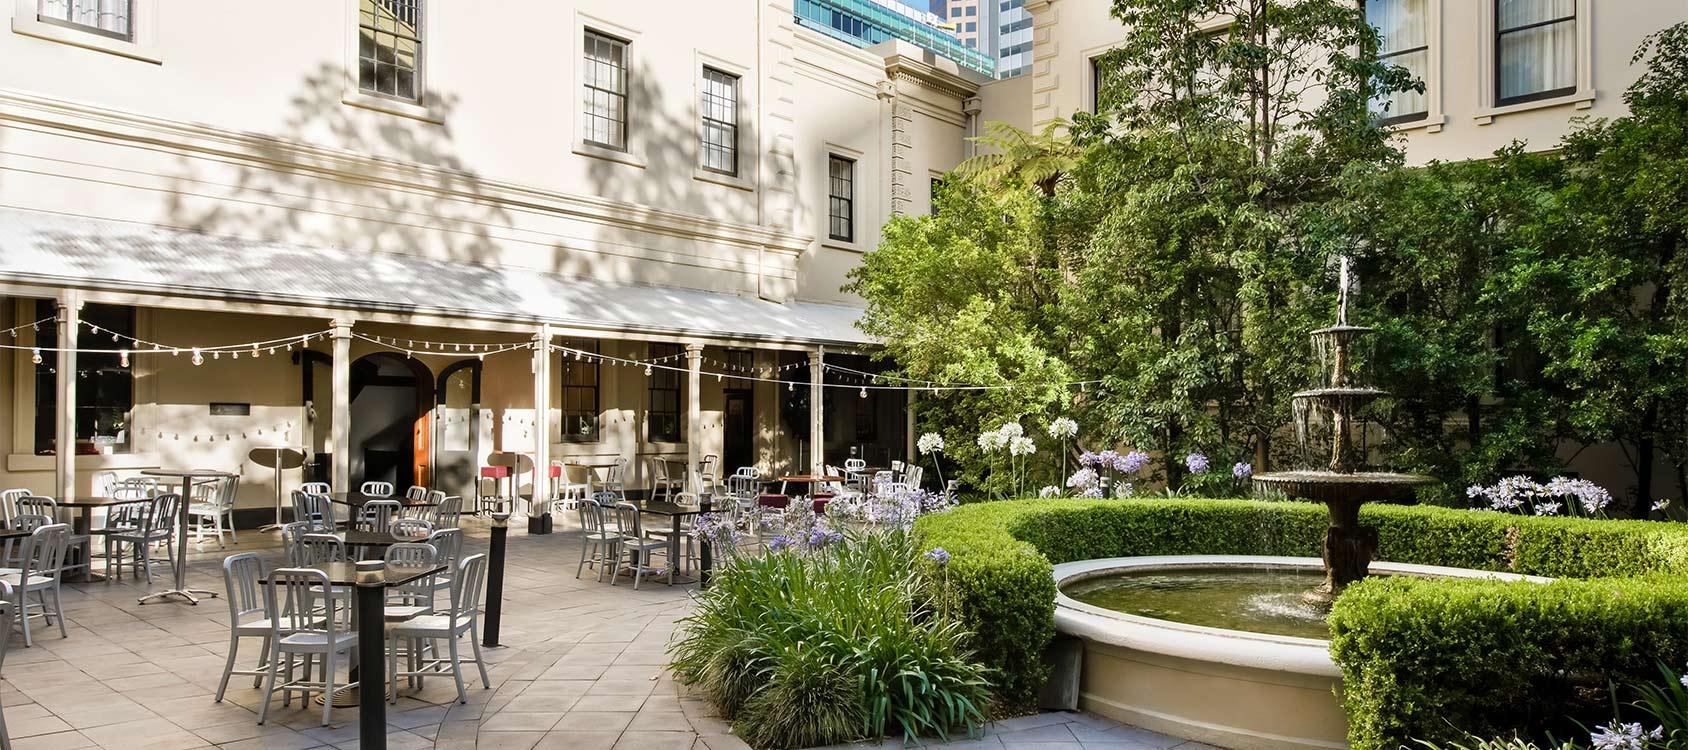 adina-apartment-hotel-adelaide-courtyard-01-2018.jpg